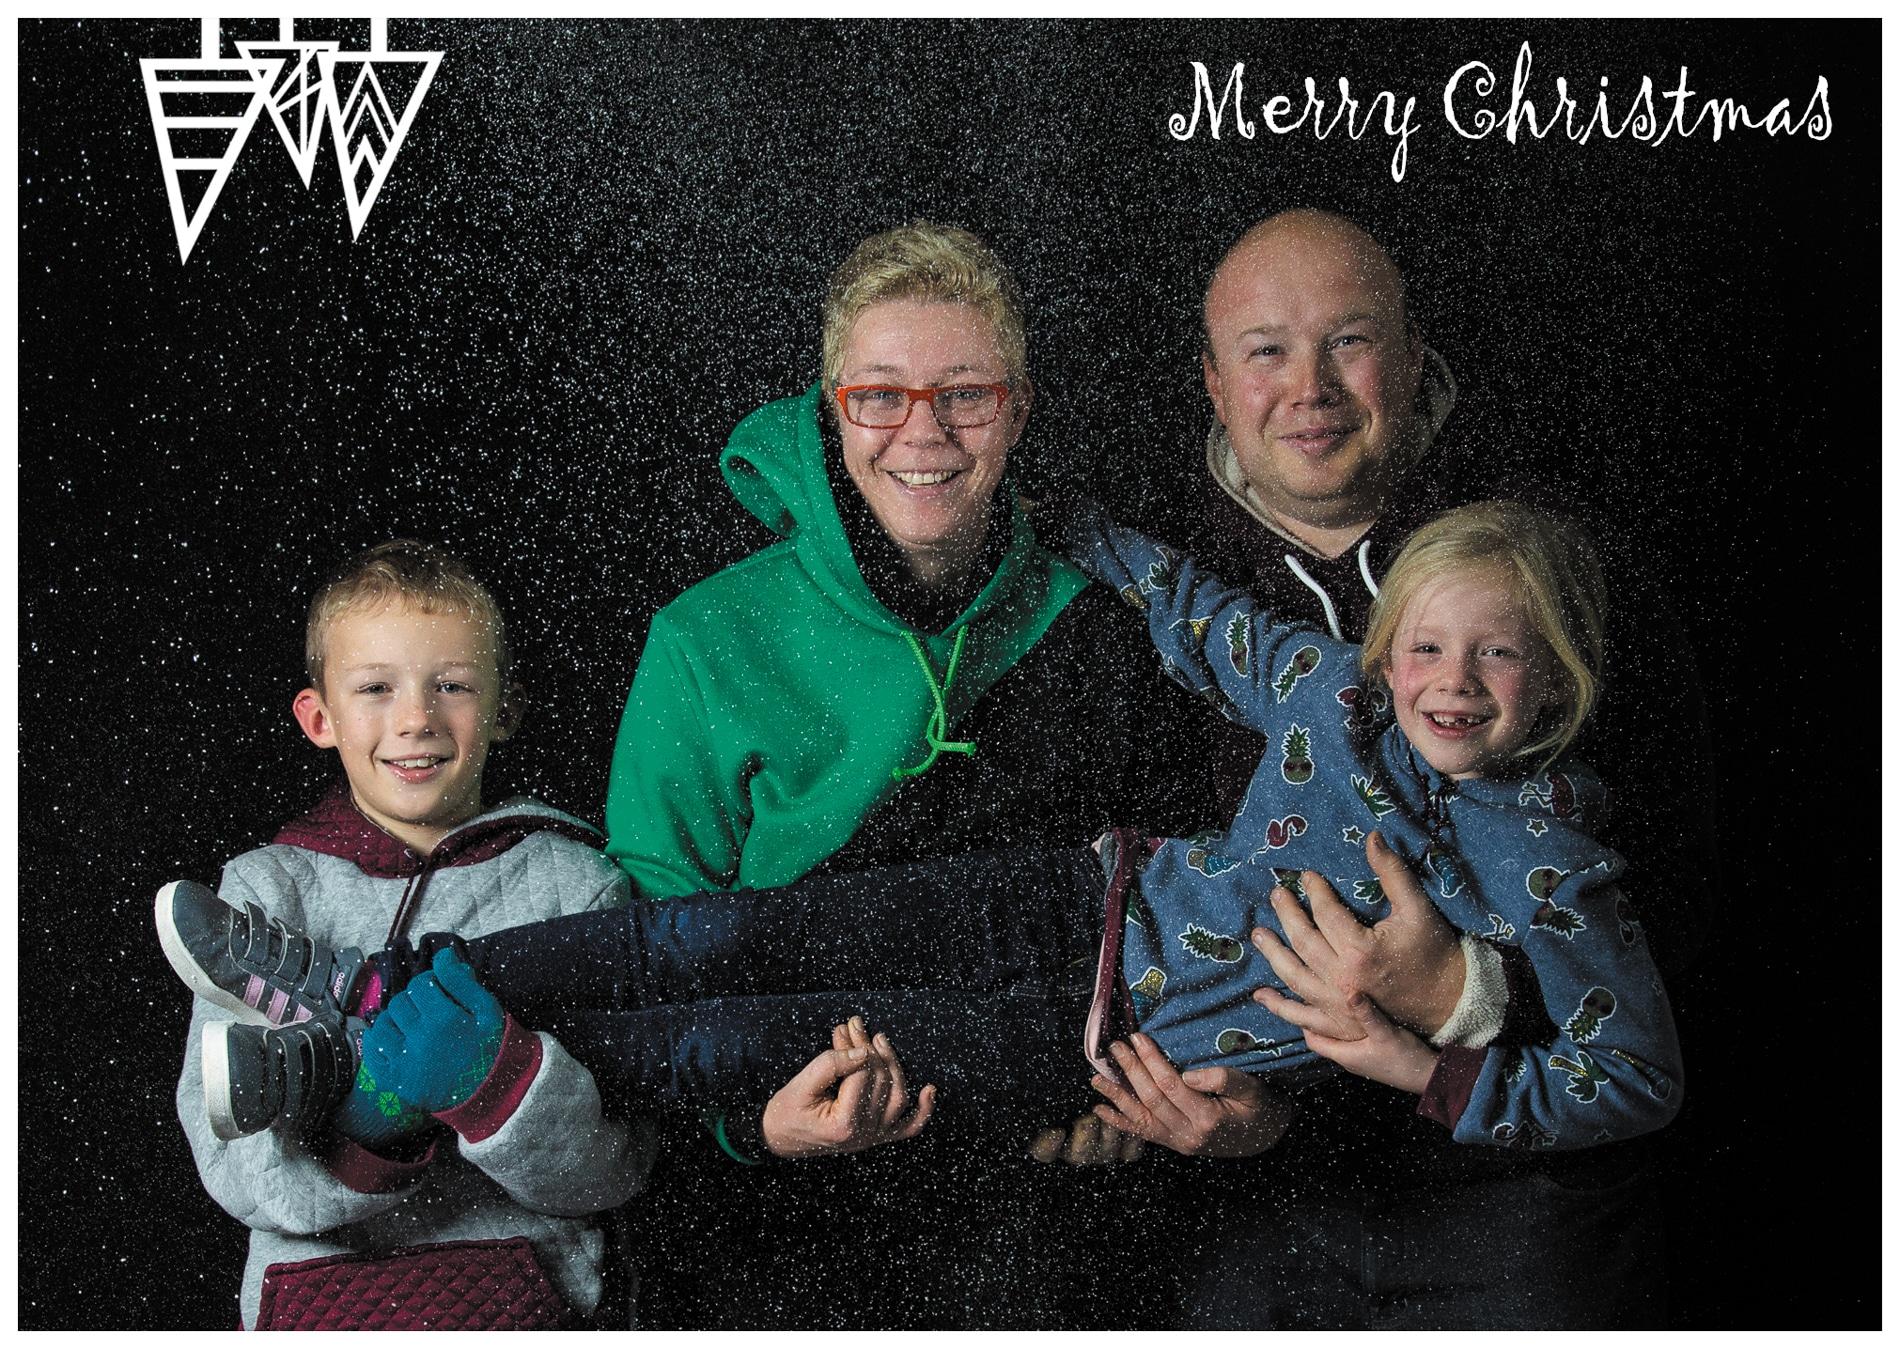 Kerst Kaartje 2018 Merry Christmas